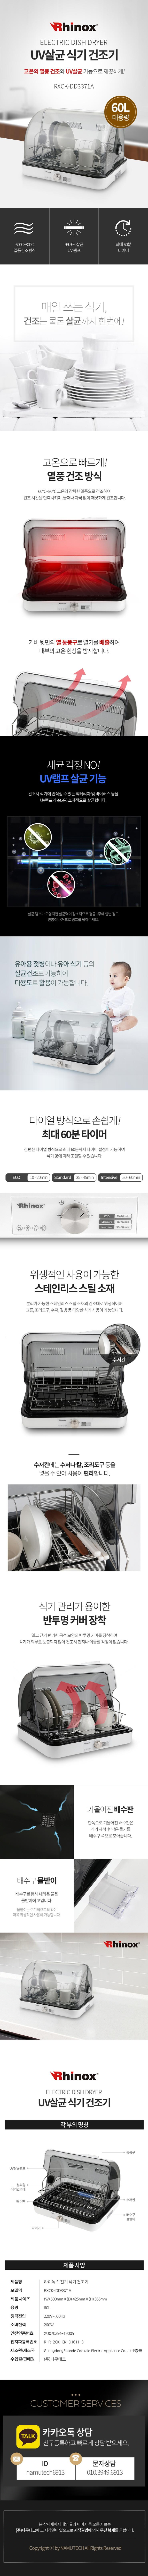 30.RXMS-MP3671A.jpg